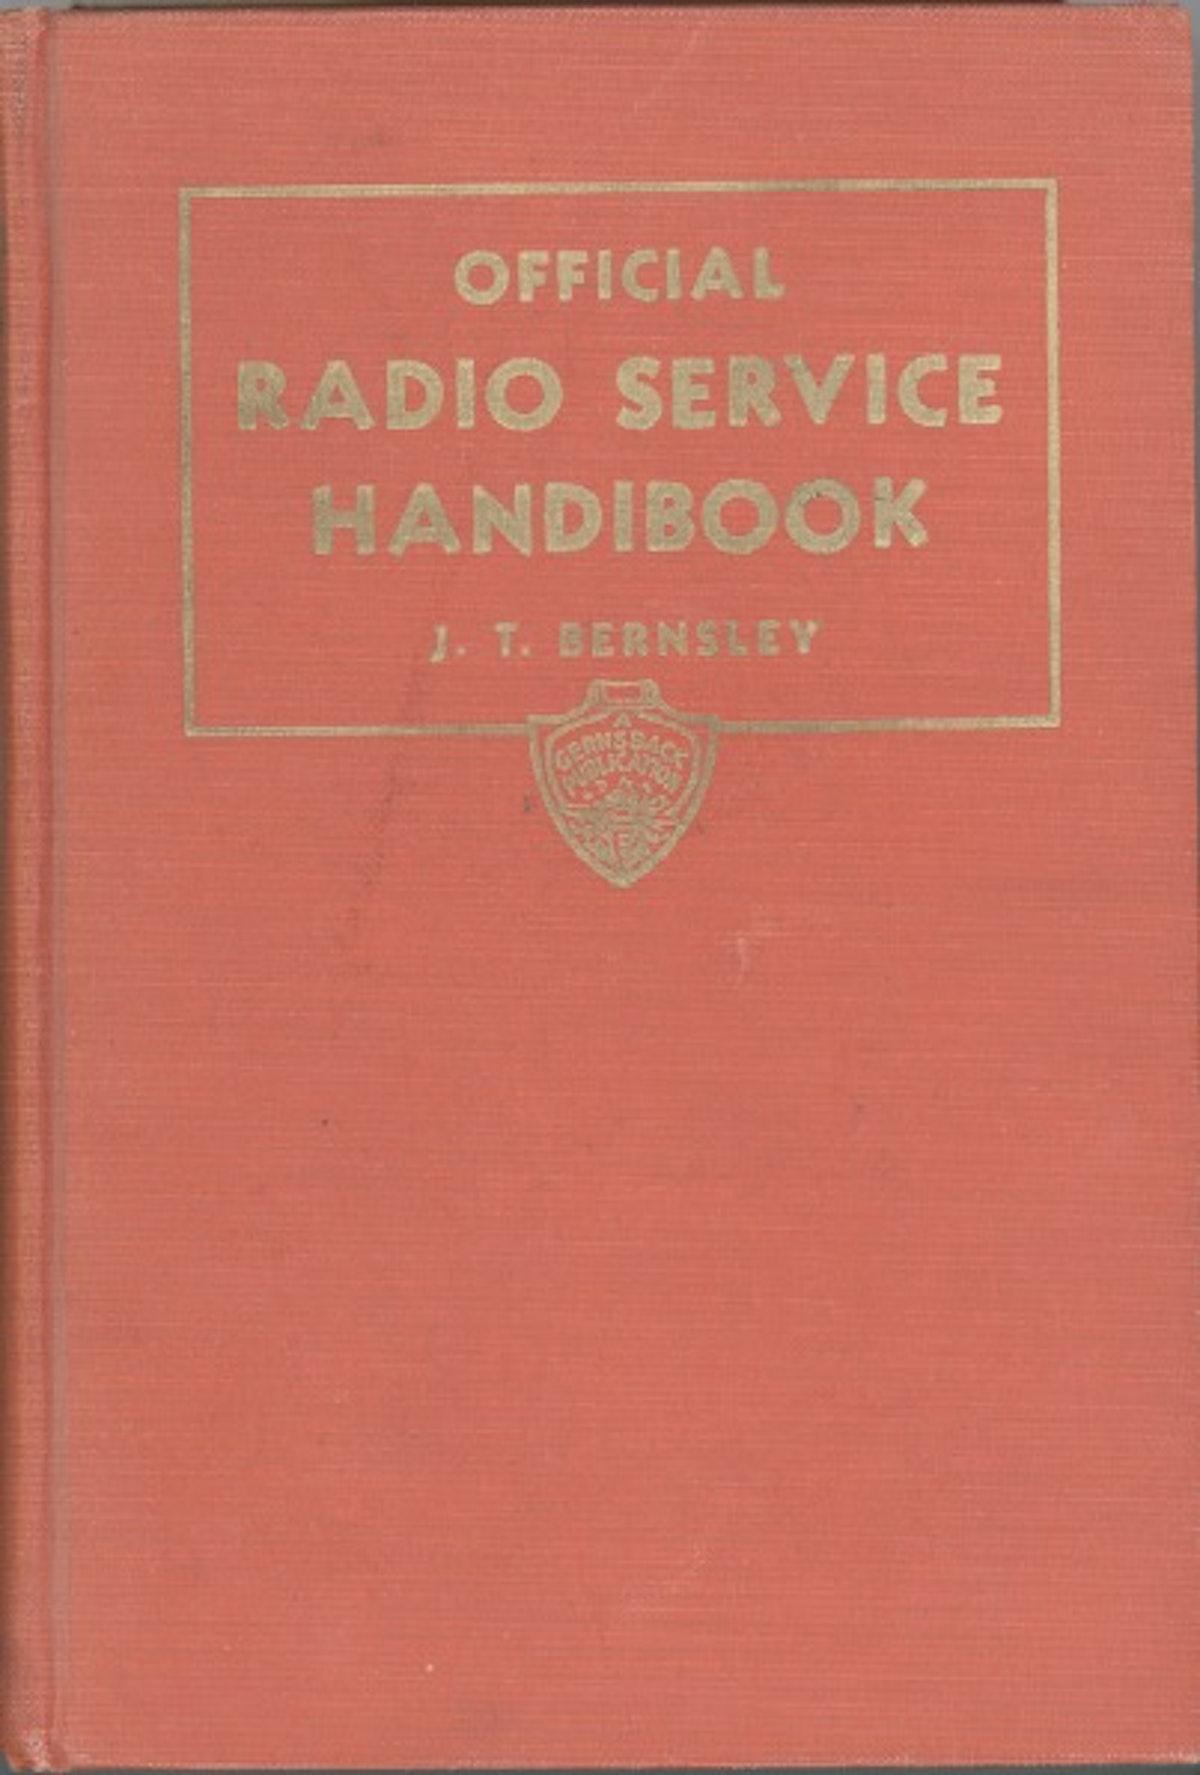 Official Radio Service Handbook